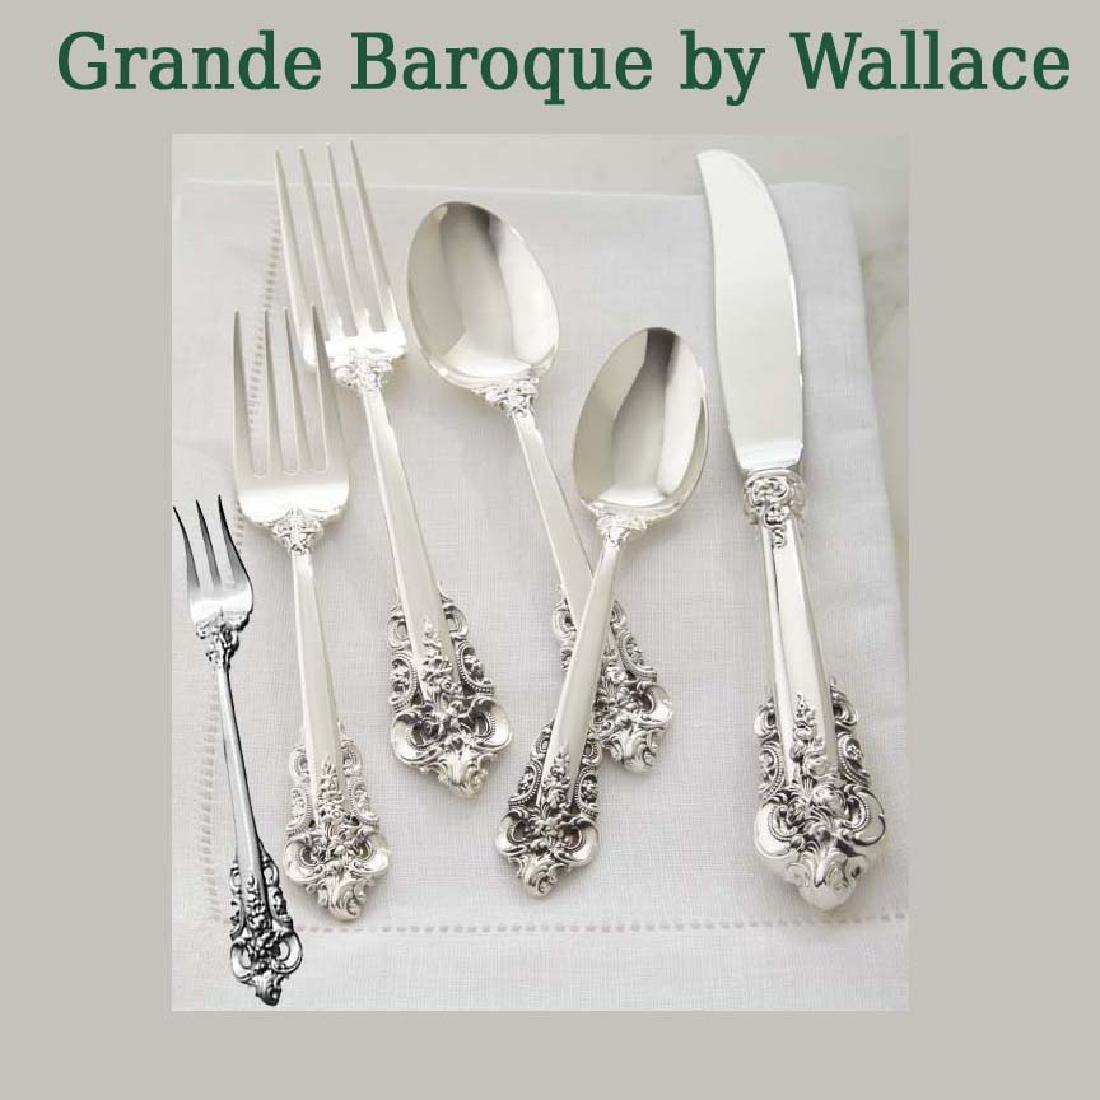 WALLACE GRANDE BAROQUE STERLING SILVER FLATWARE 98 Pcs.